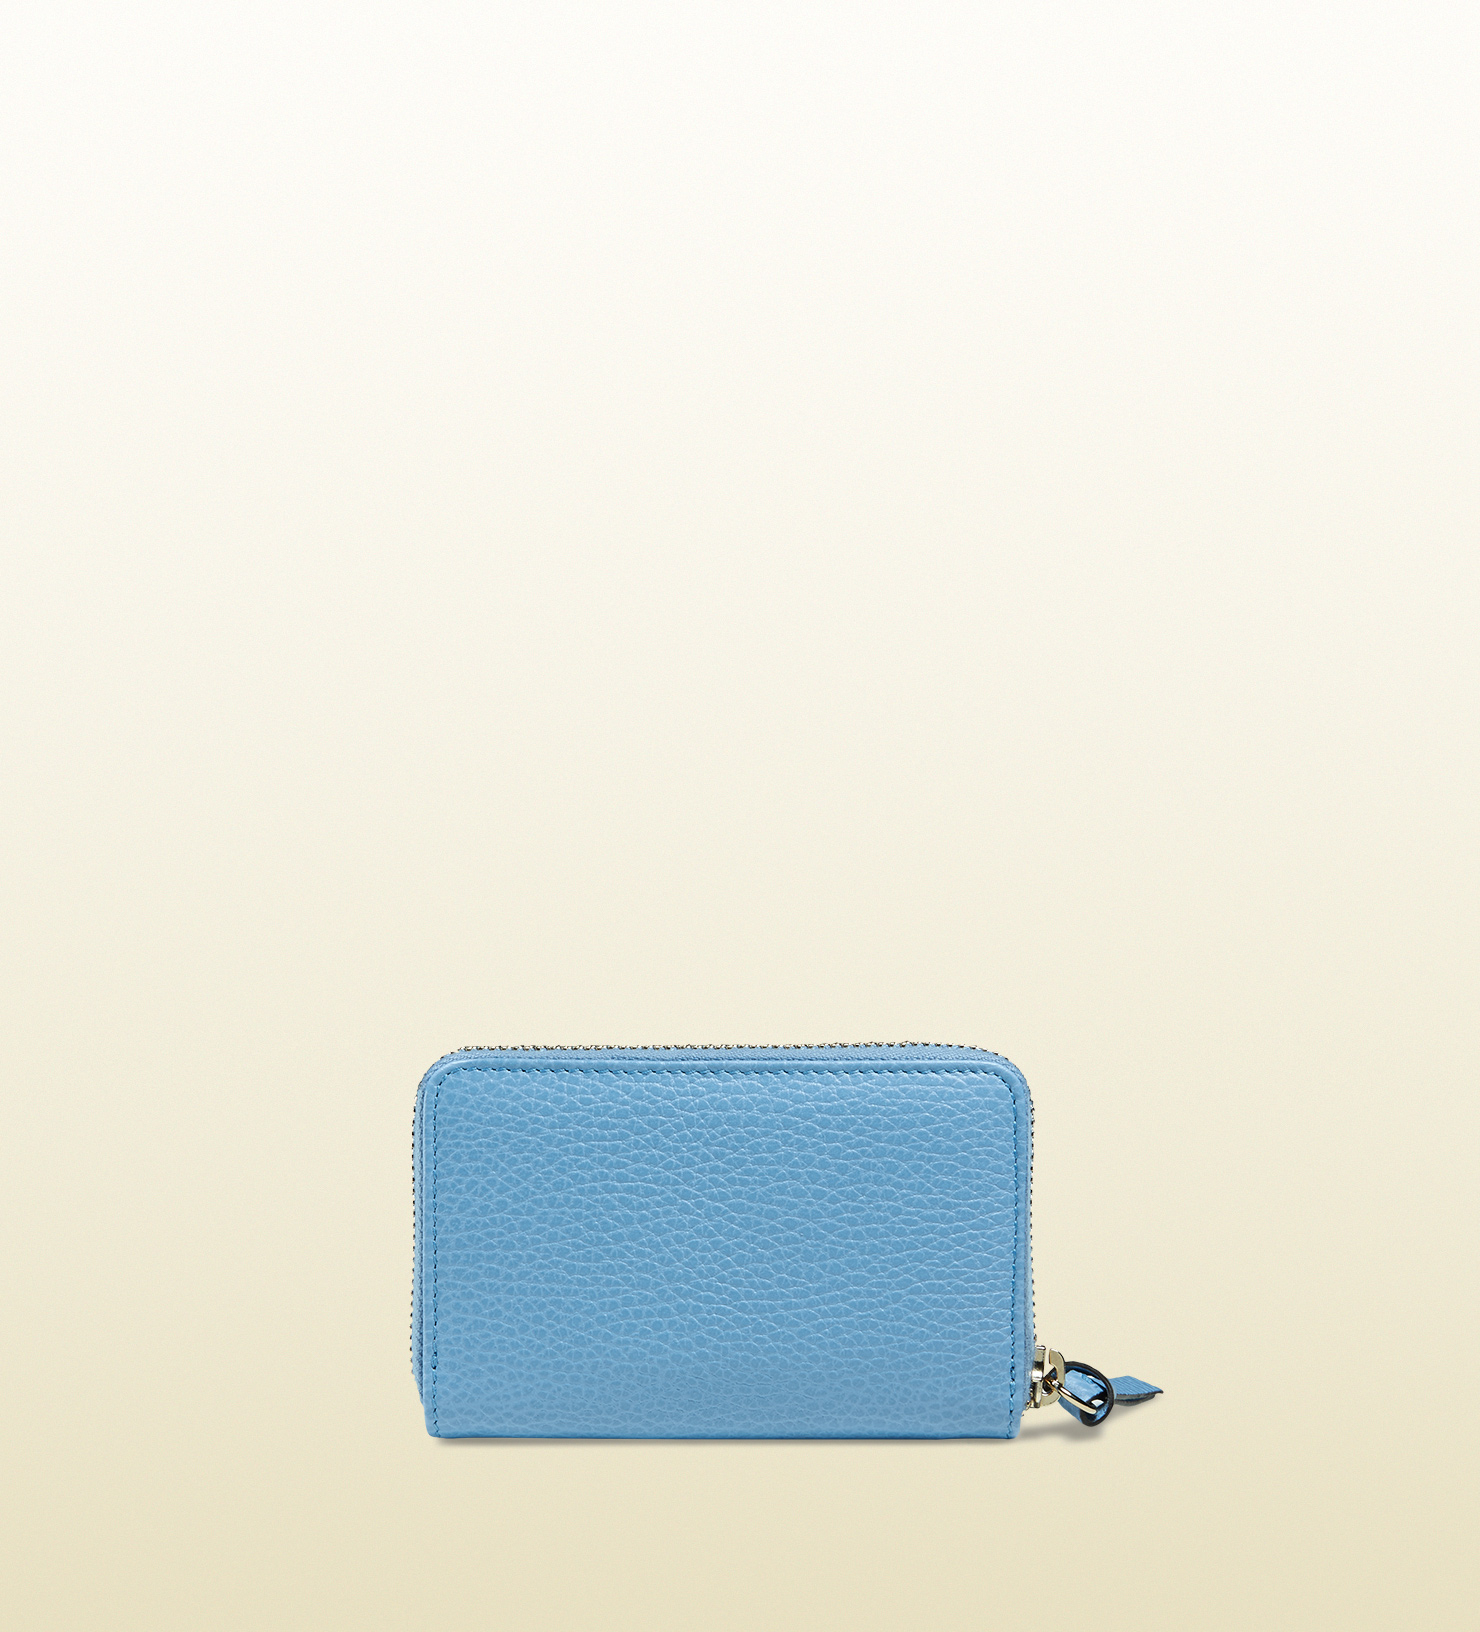 8147144edb6e Lyst - Gucci Swing Leather Zip Card Case in Blue